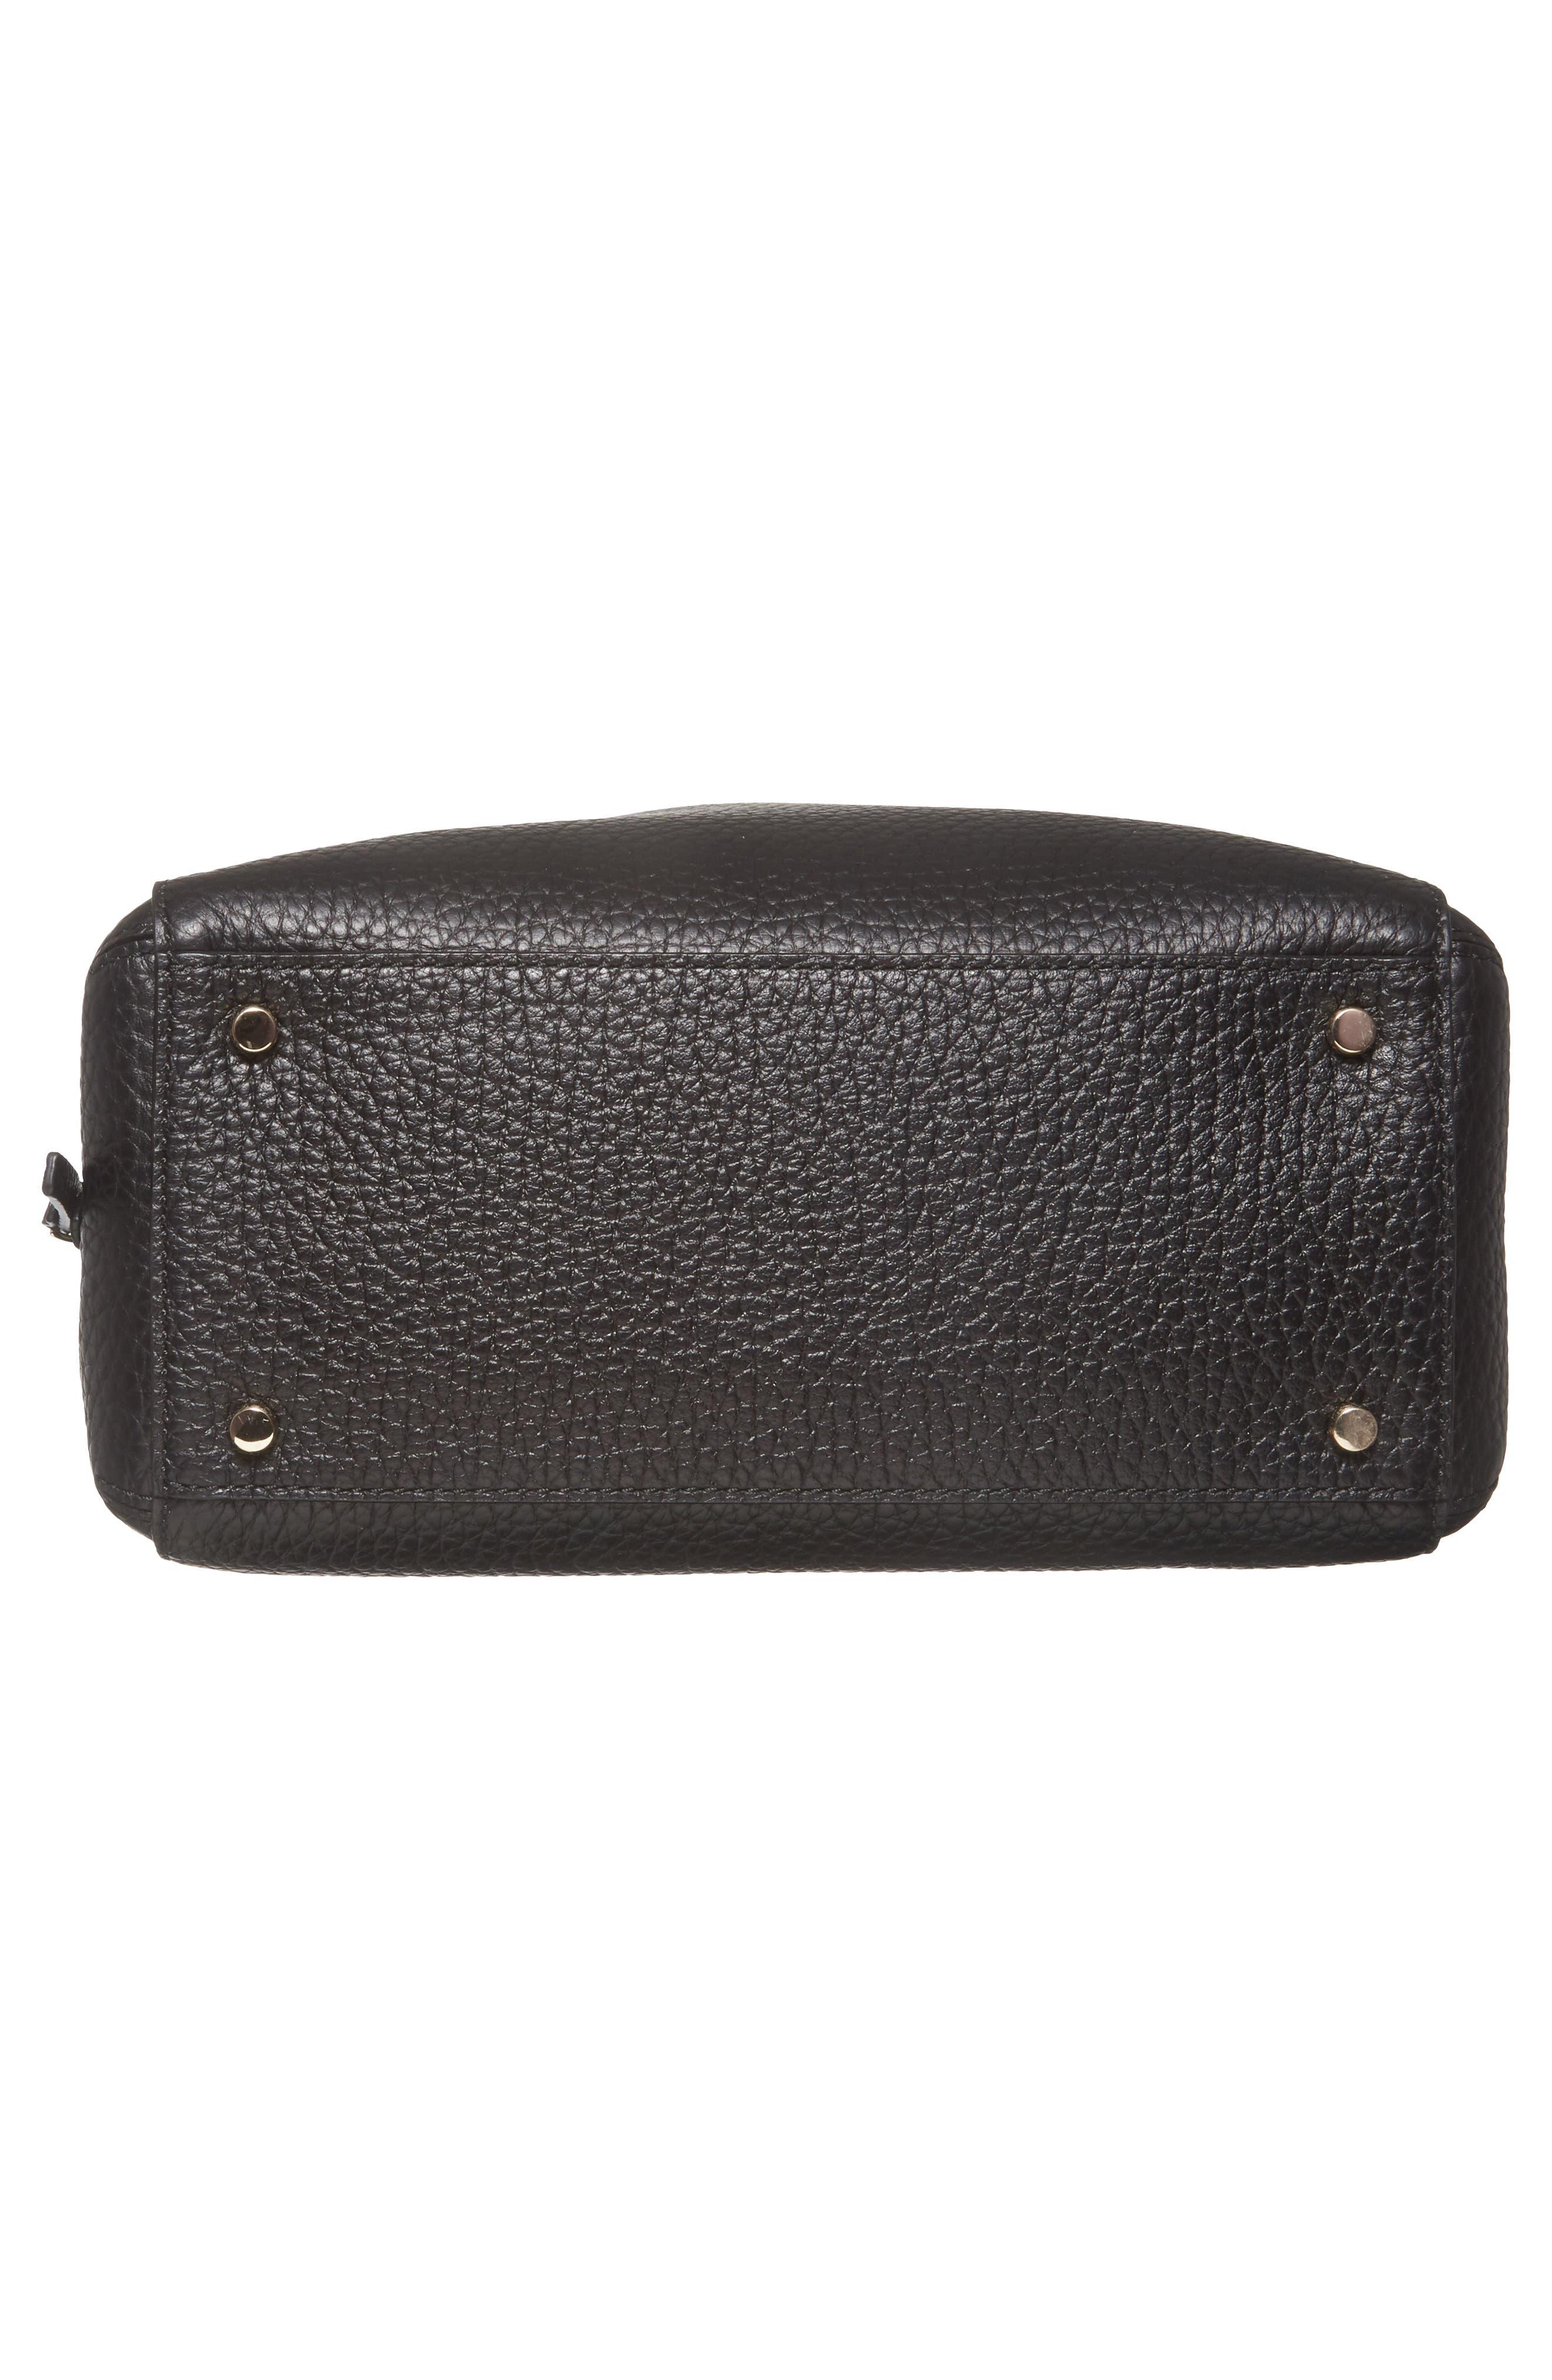 carter street - aliana leather satchel,                             Alternate thumbnail 6, color,                             001